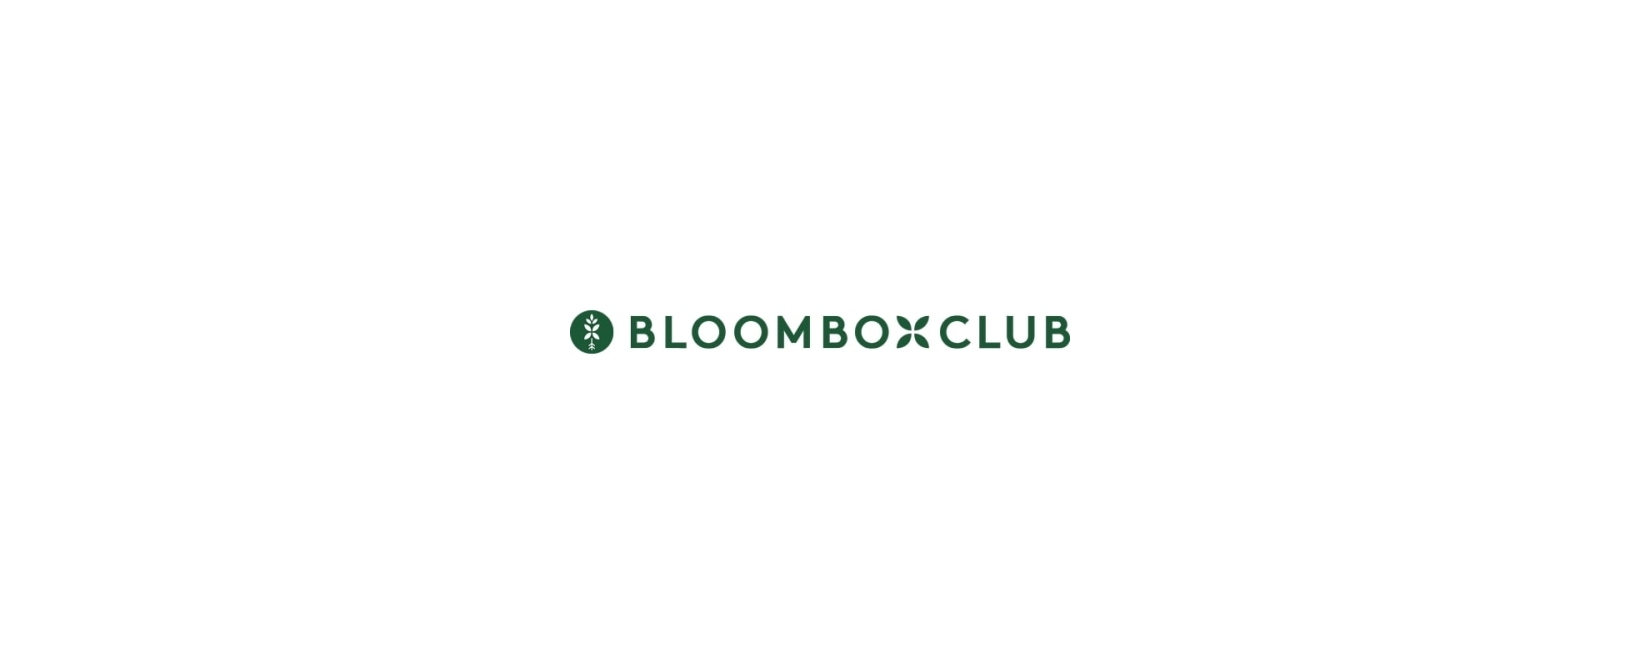 Bloombox Club UK Discount Code 2021